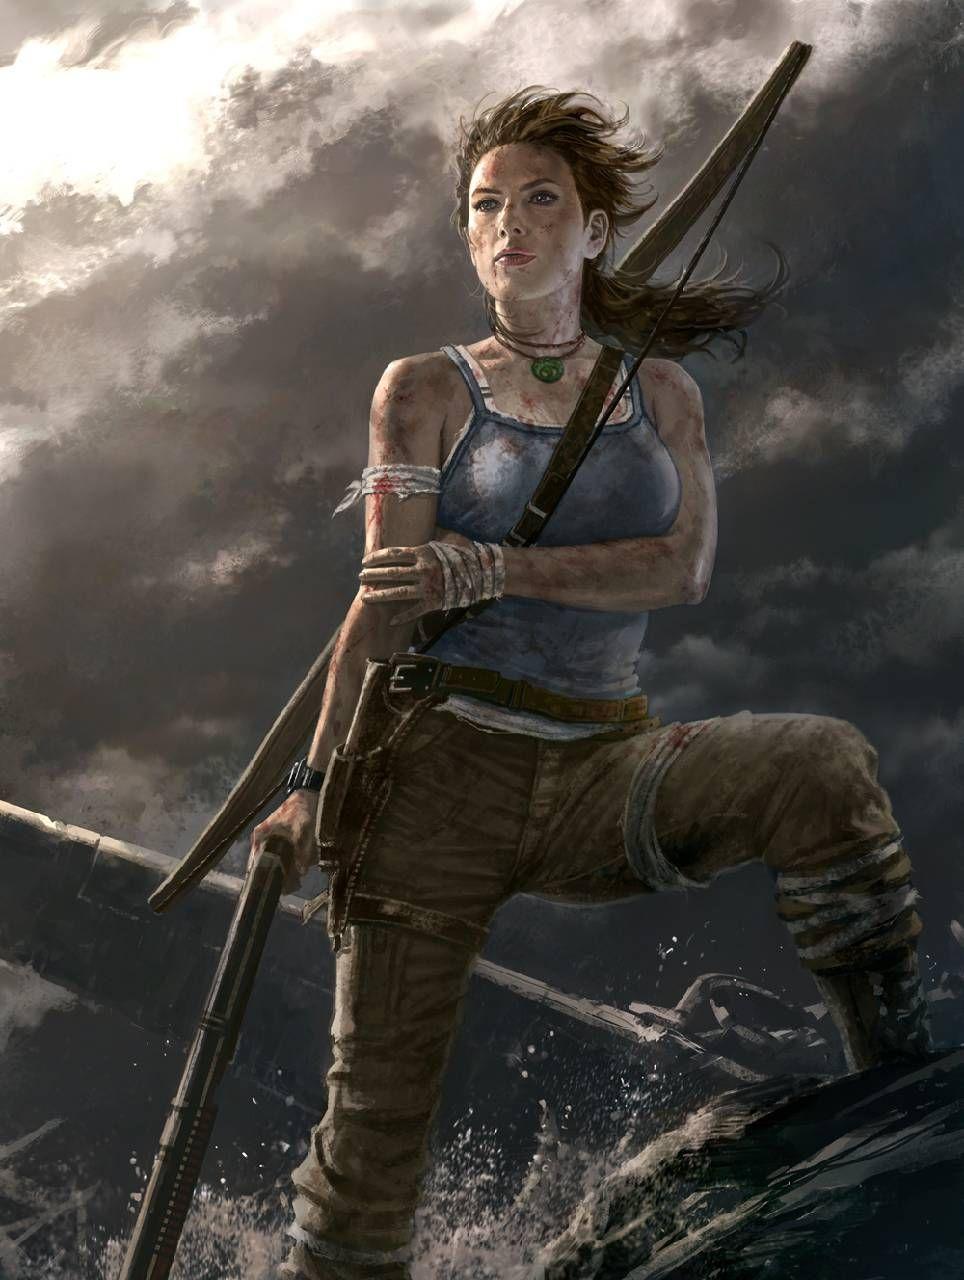 Download Lara Croft Wallpaper By Dinozmaj13 2a Free On